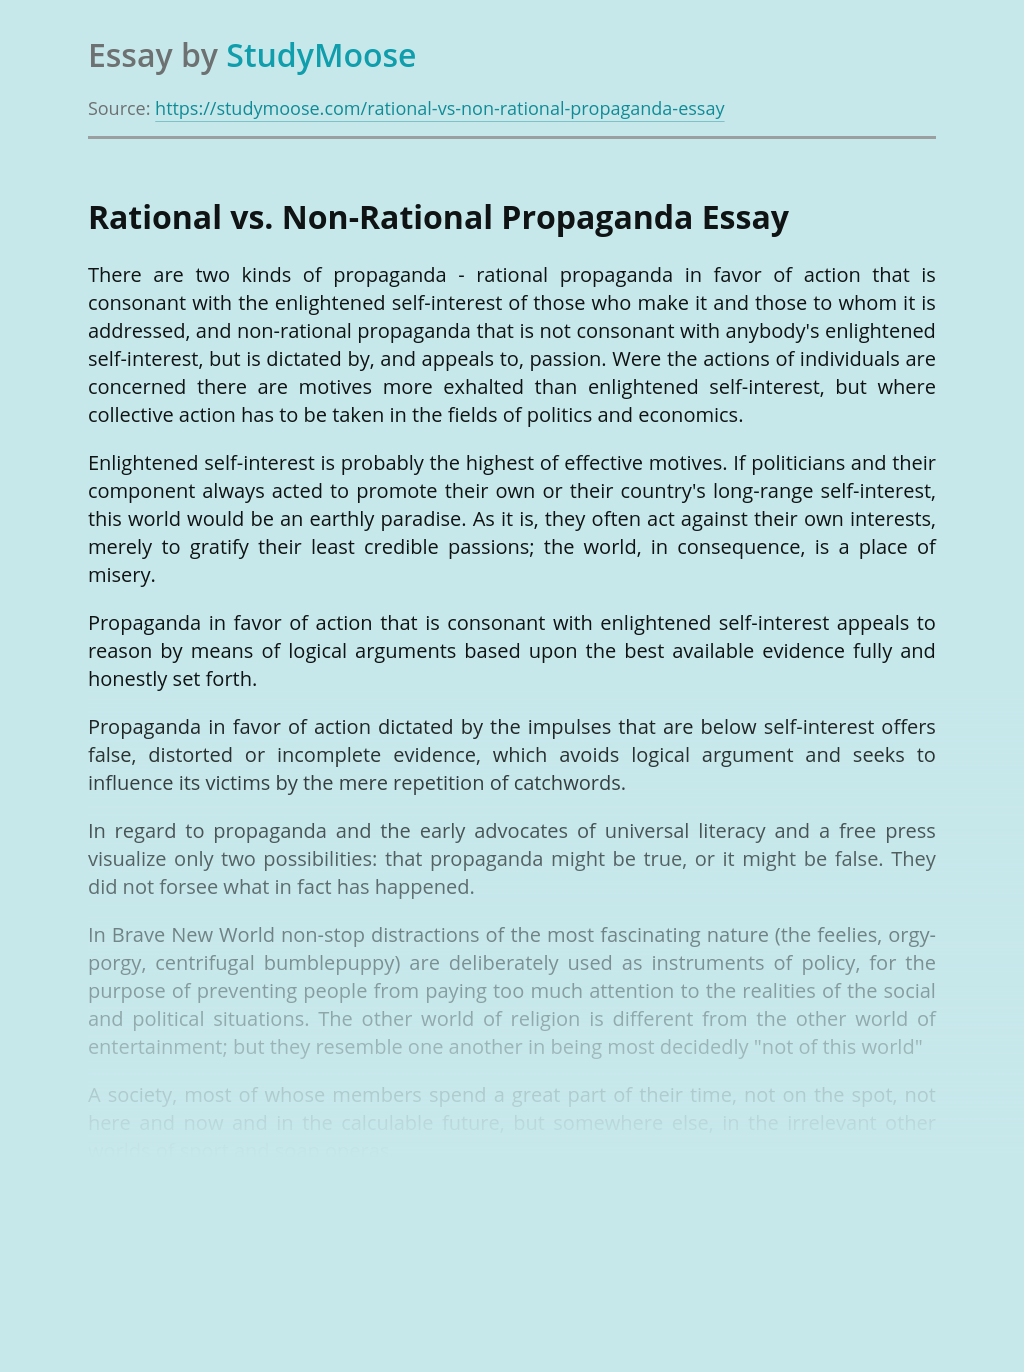 Rational vs. Non-Rational Propaganda